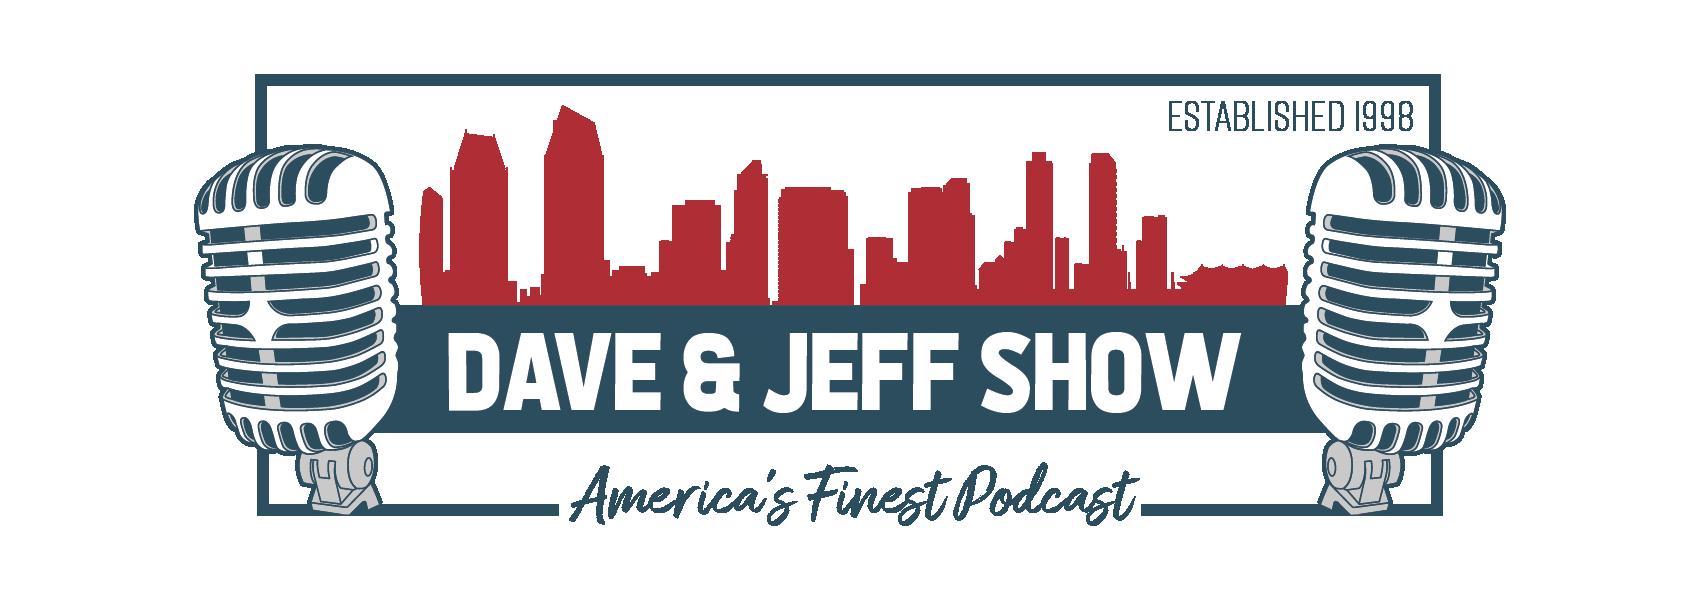 Dave & Jeff Show Logo